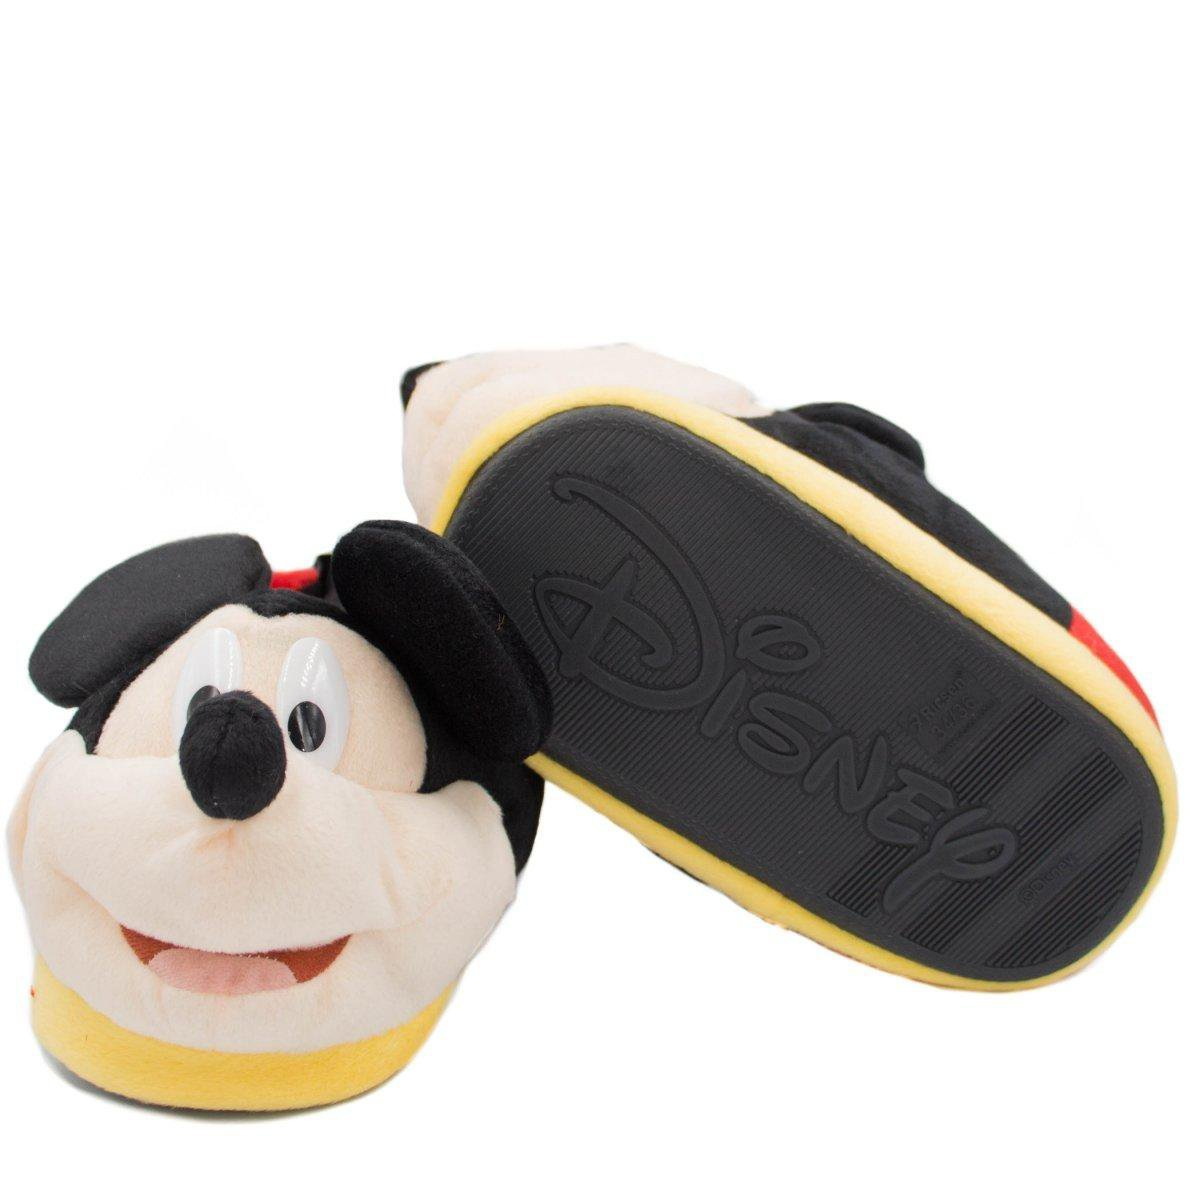 Pantufa Mickey Vintage 3d - Ricsen Ref:18374